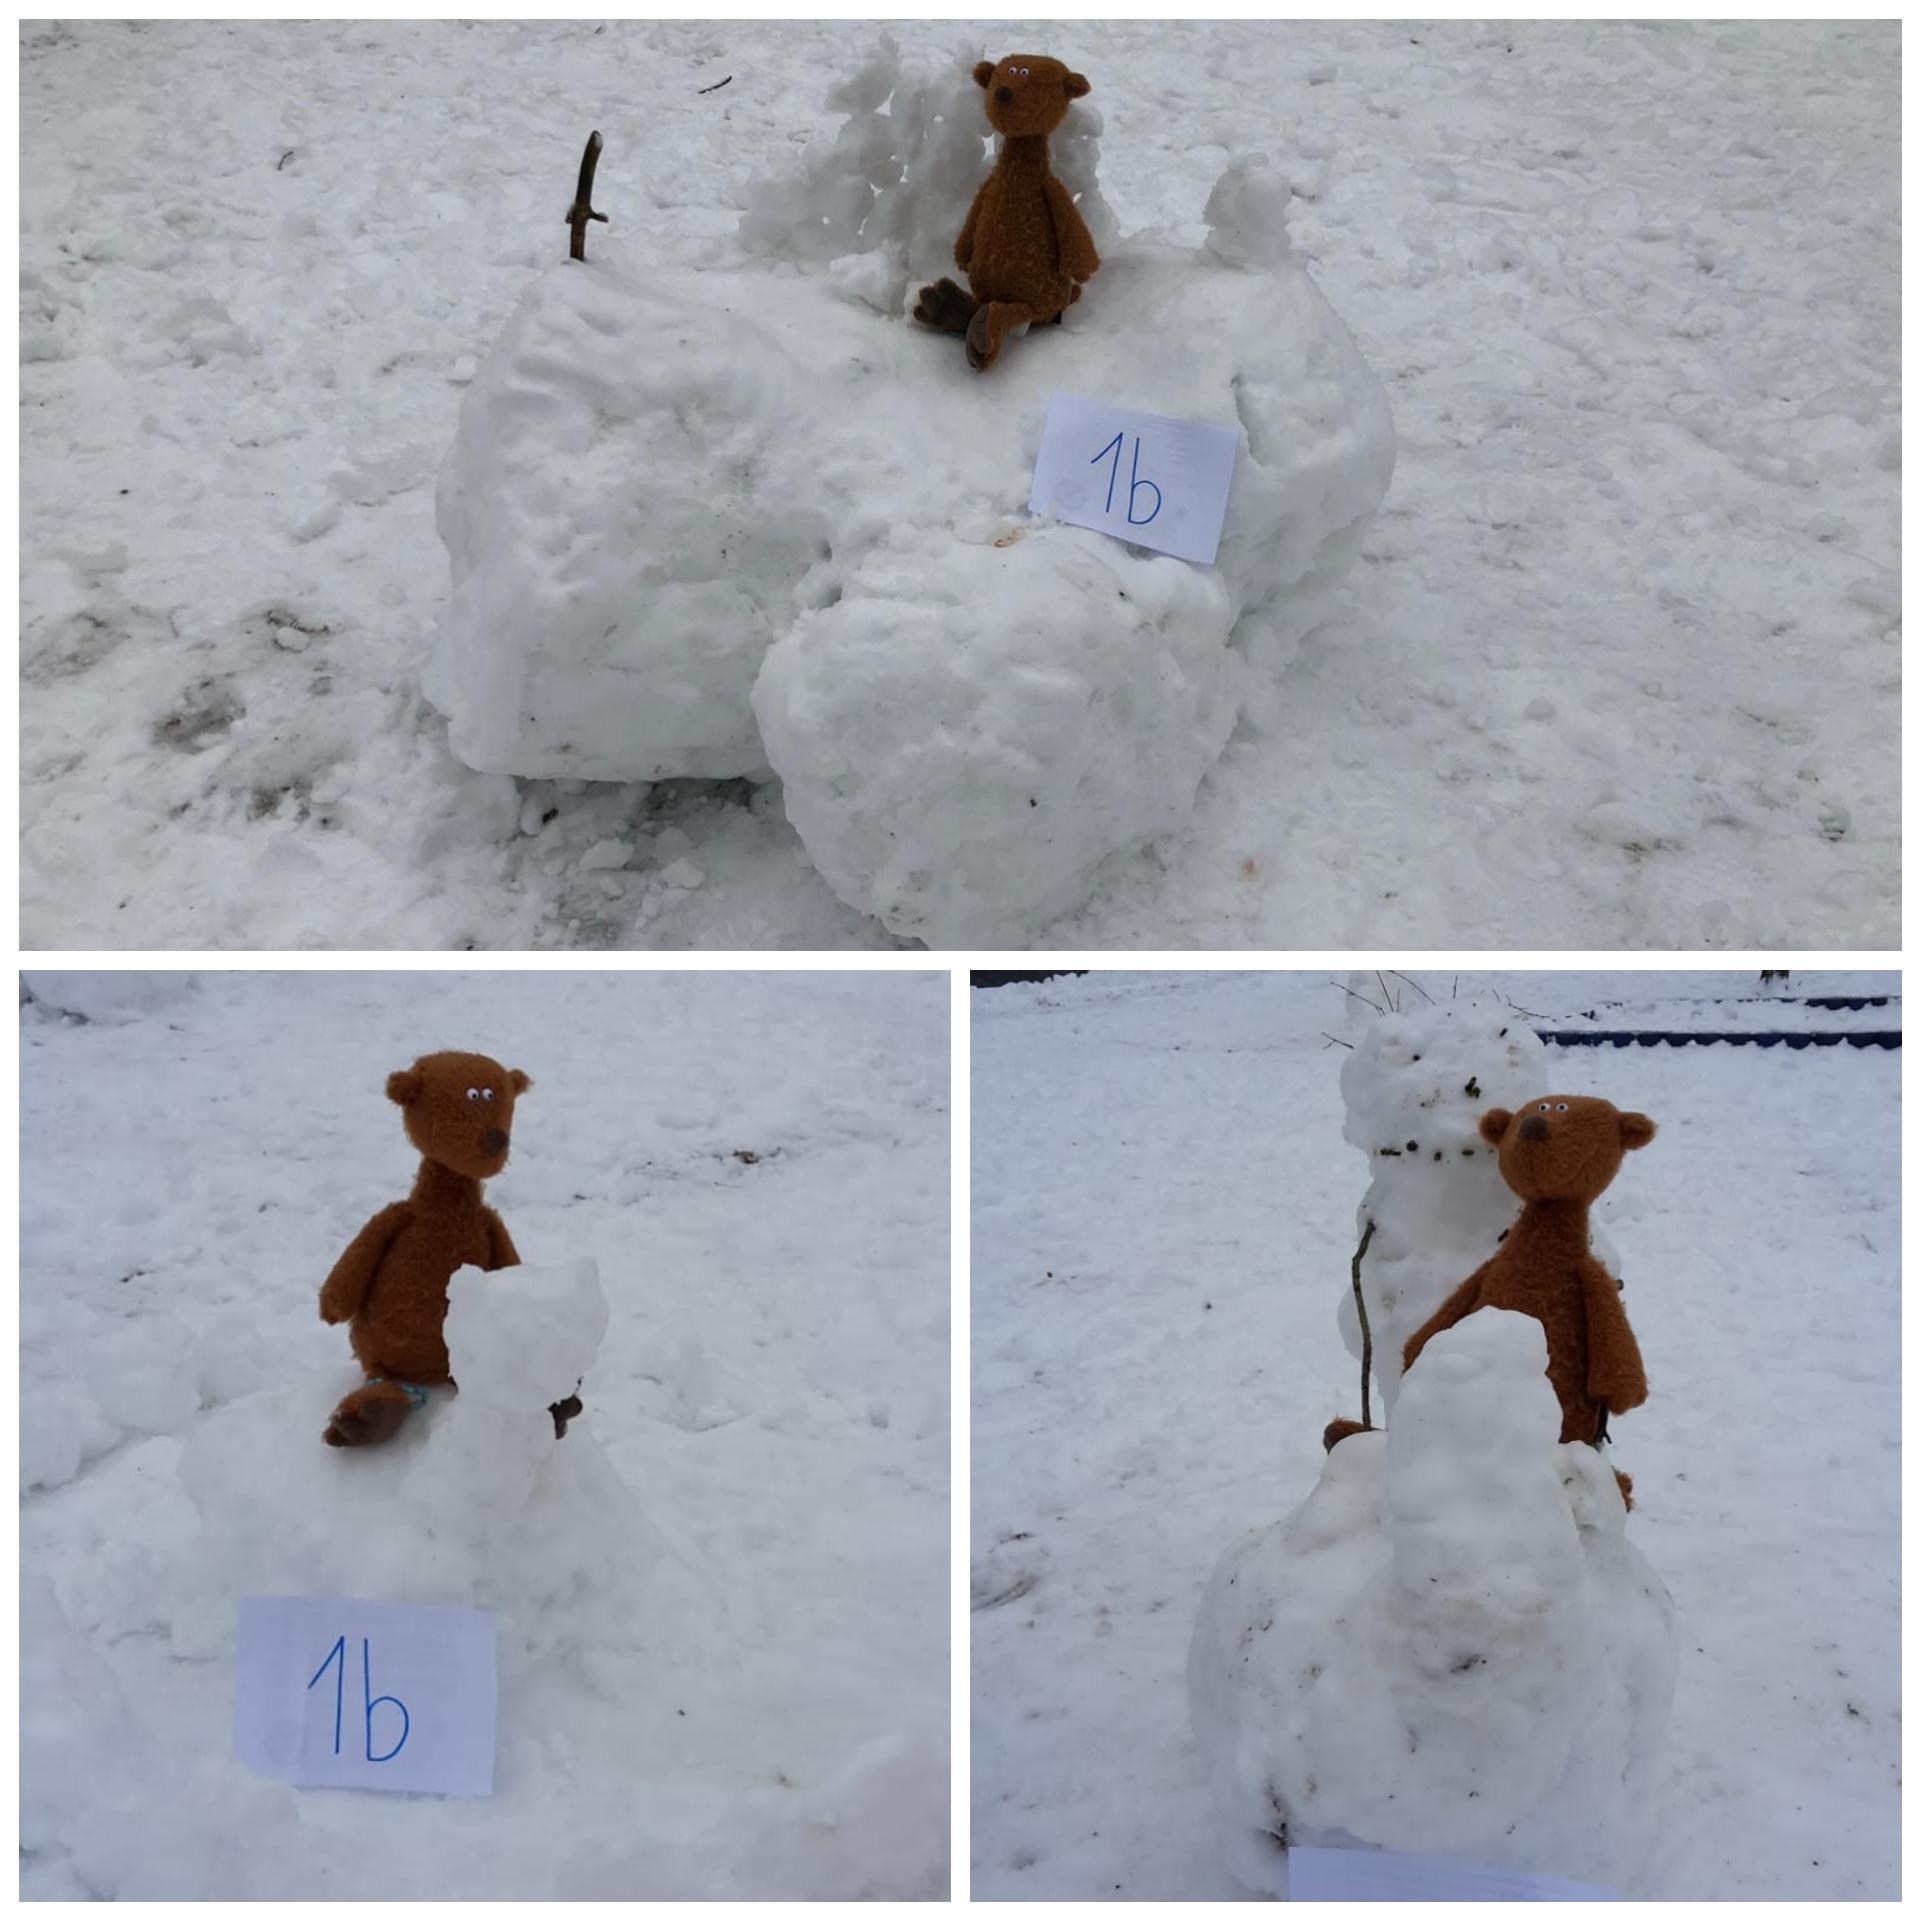 Schneefiguren_1b